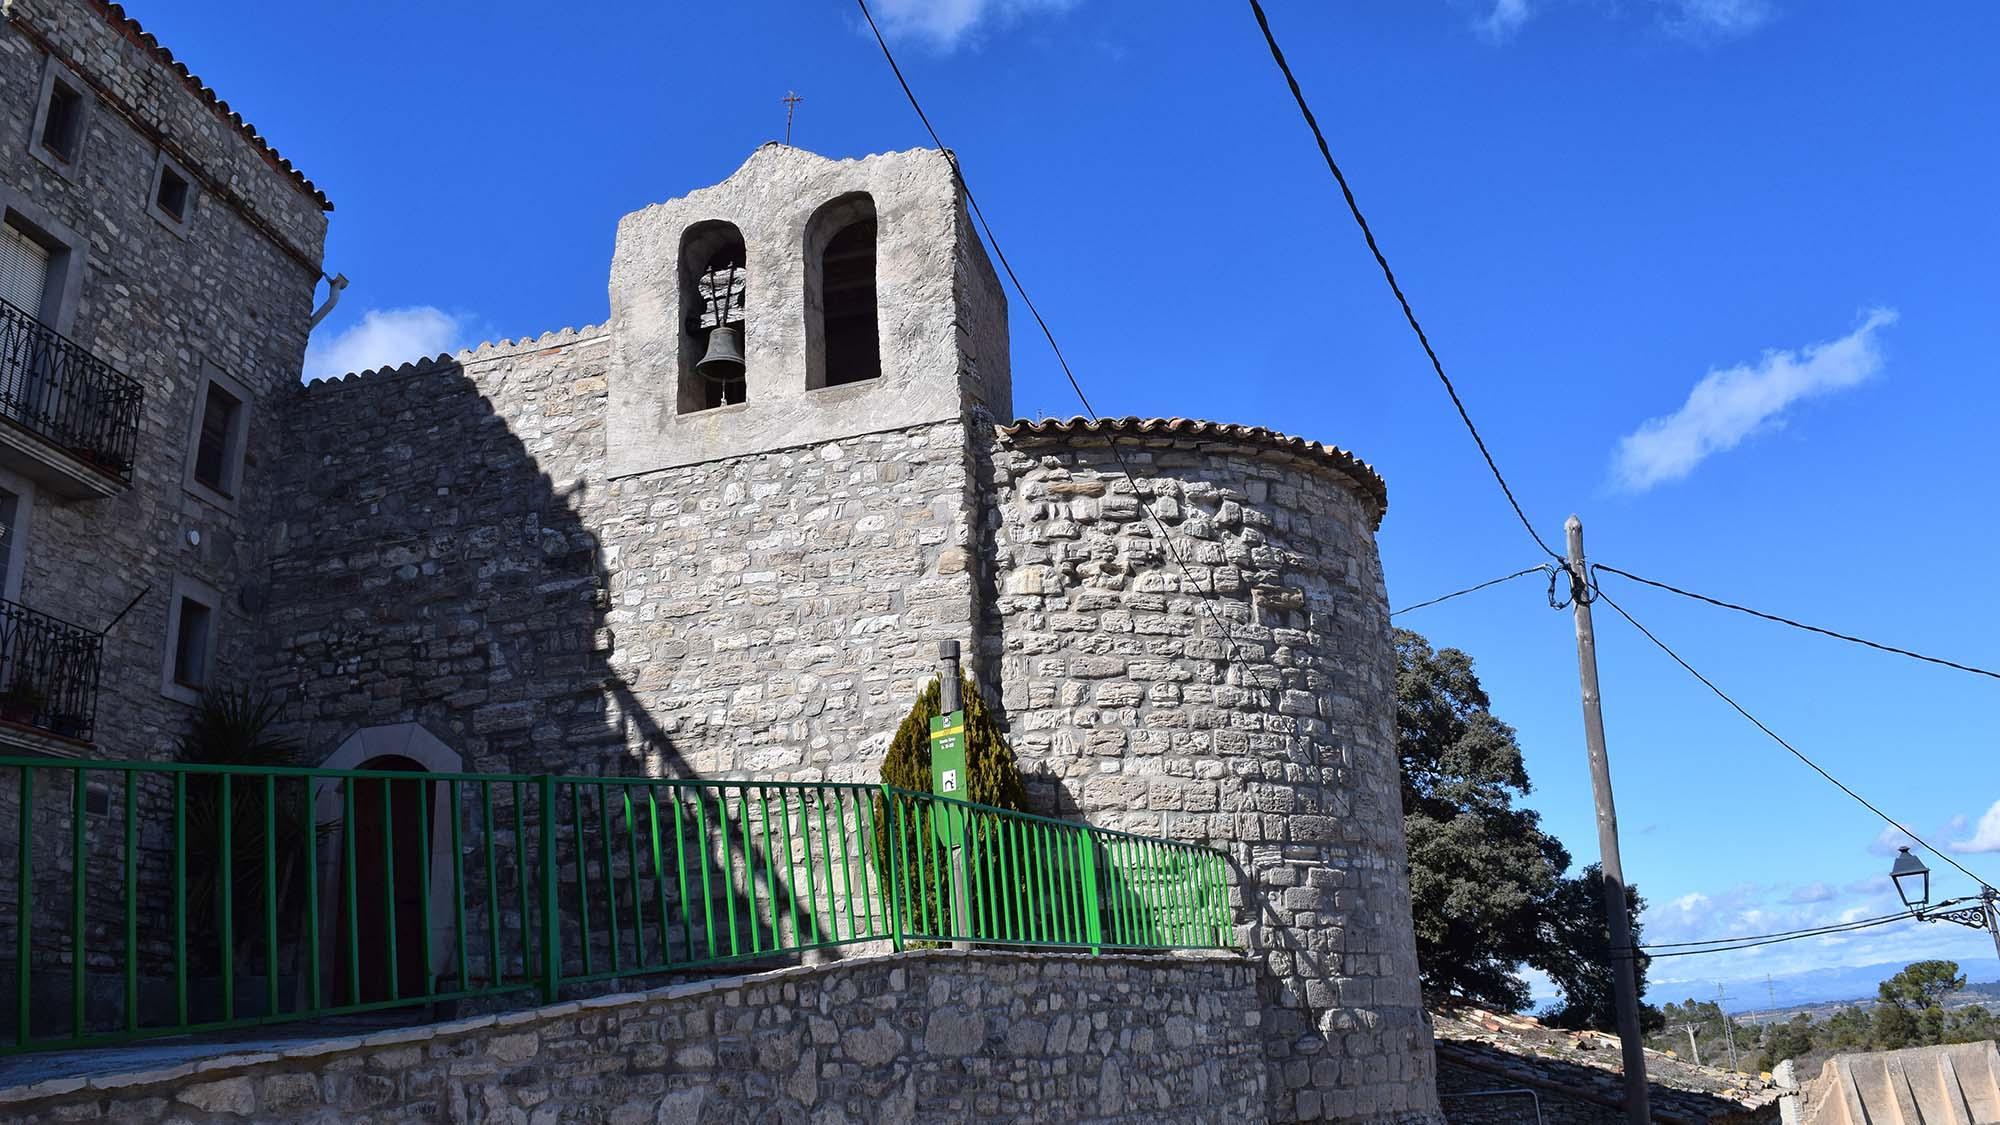 Church of Santa Creu